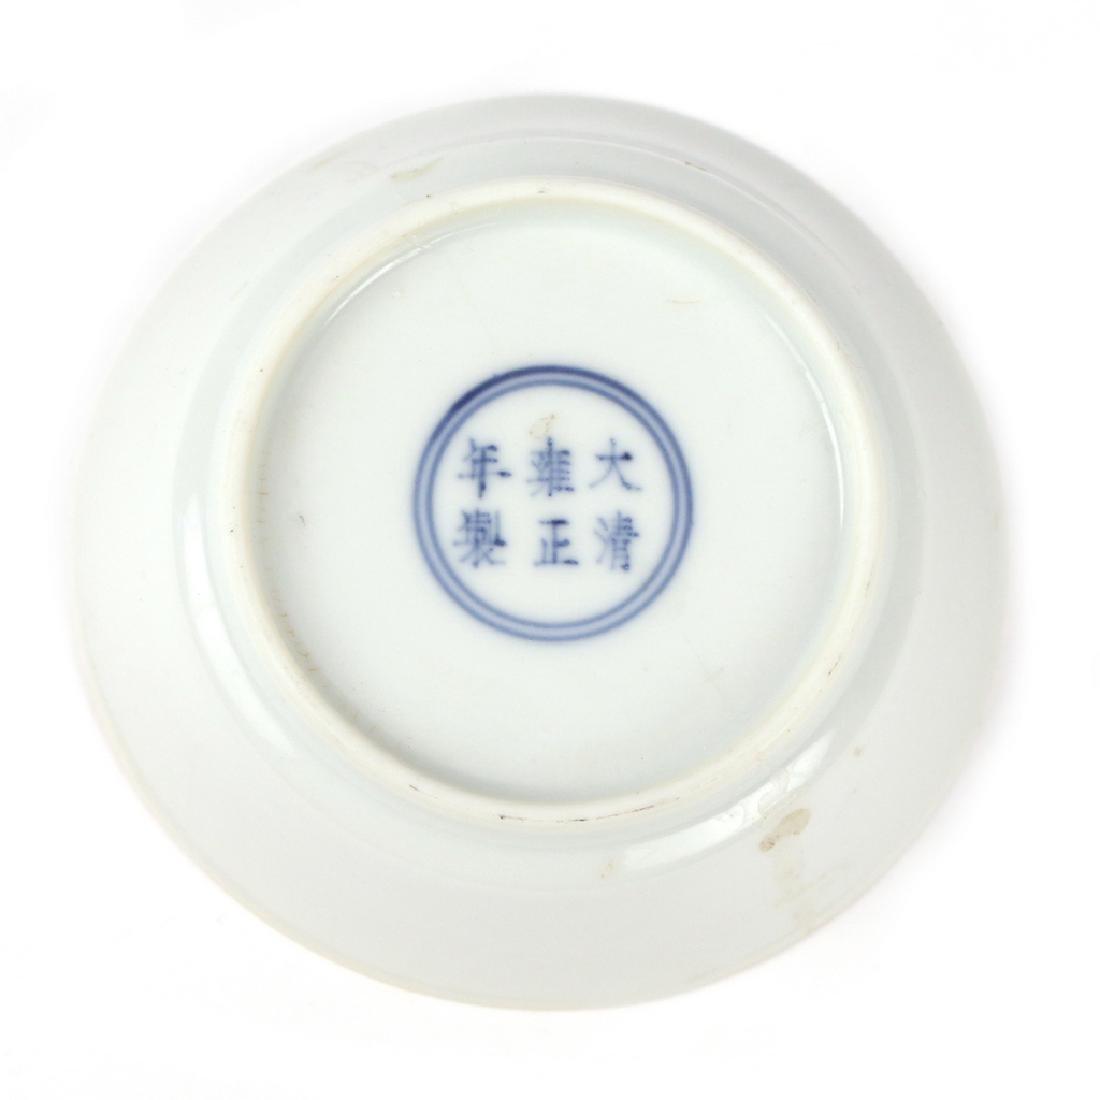 CHINESE ENAMEL PORCELAIN SAUCER - 4